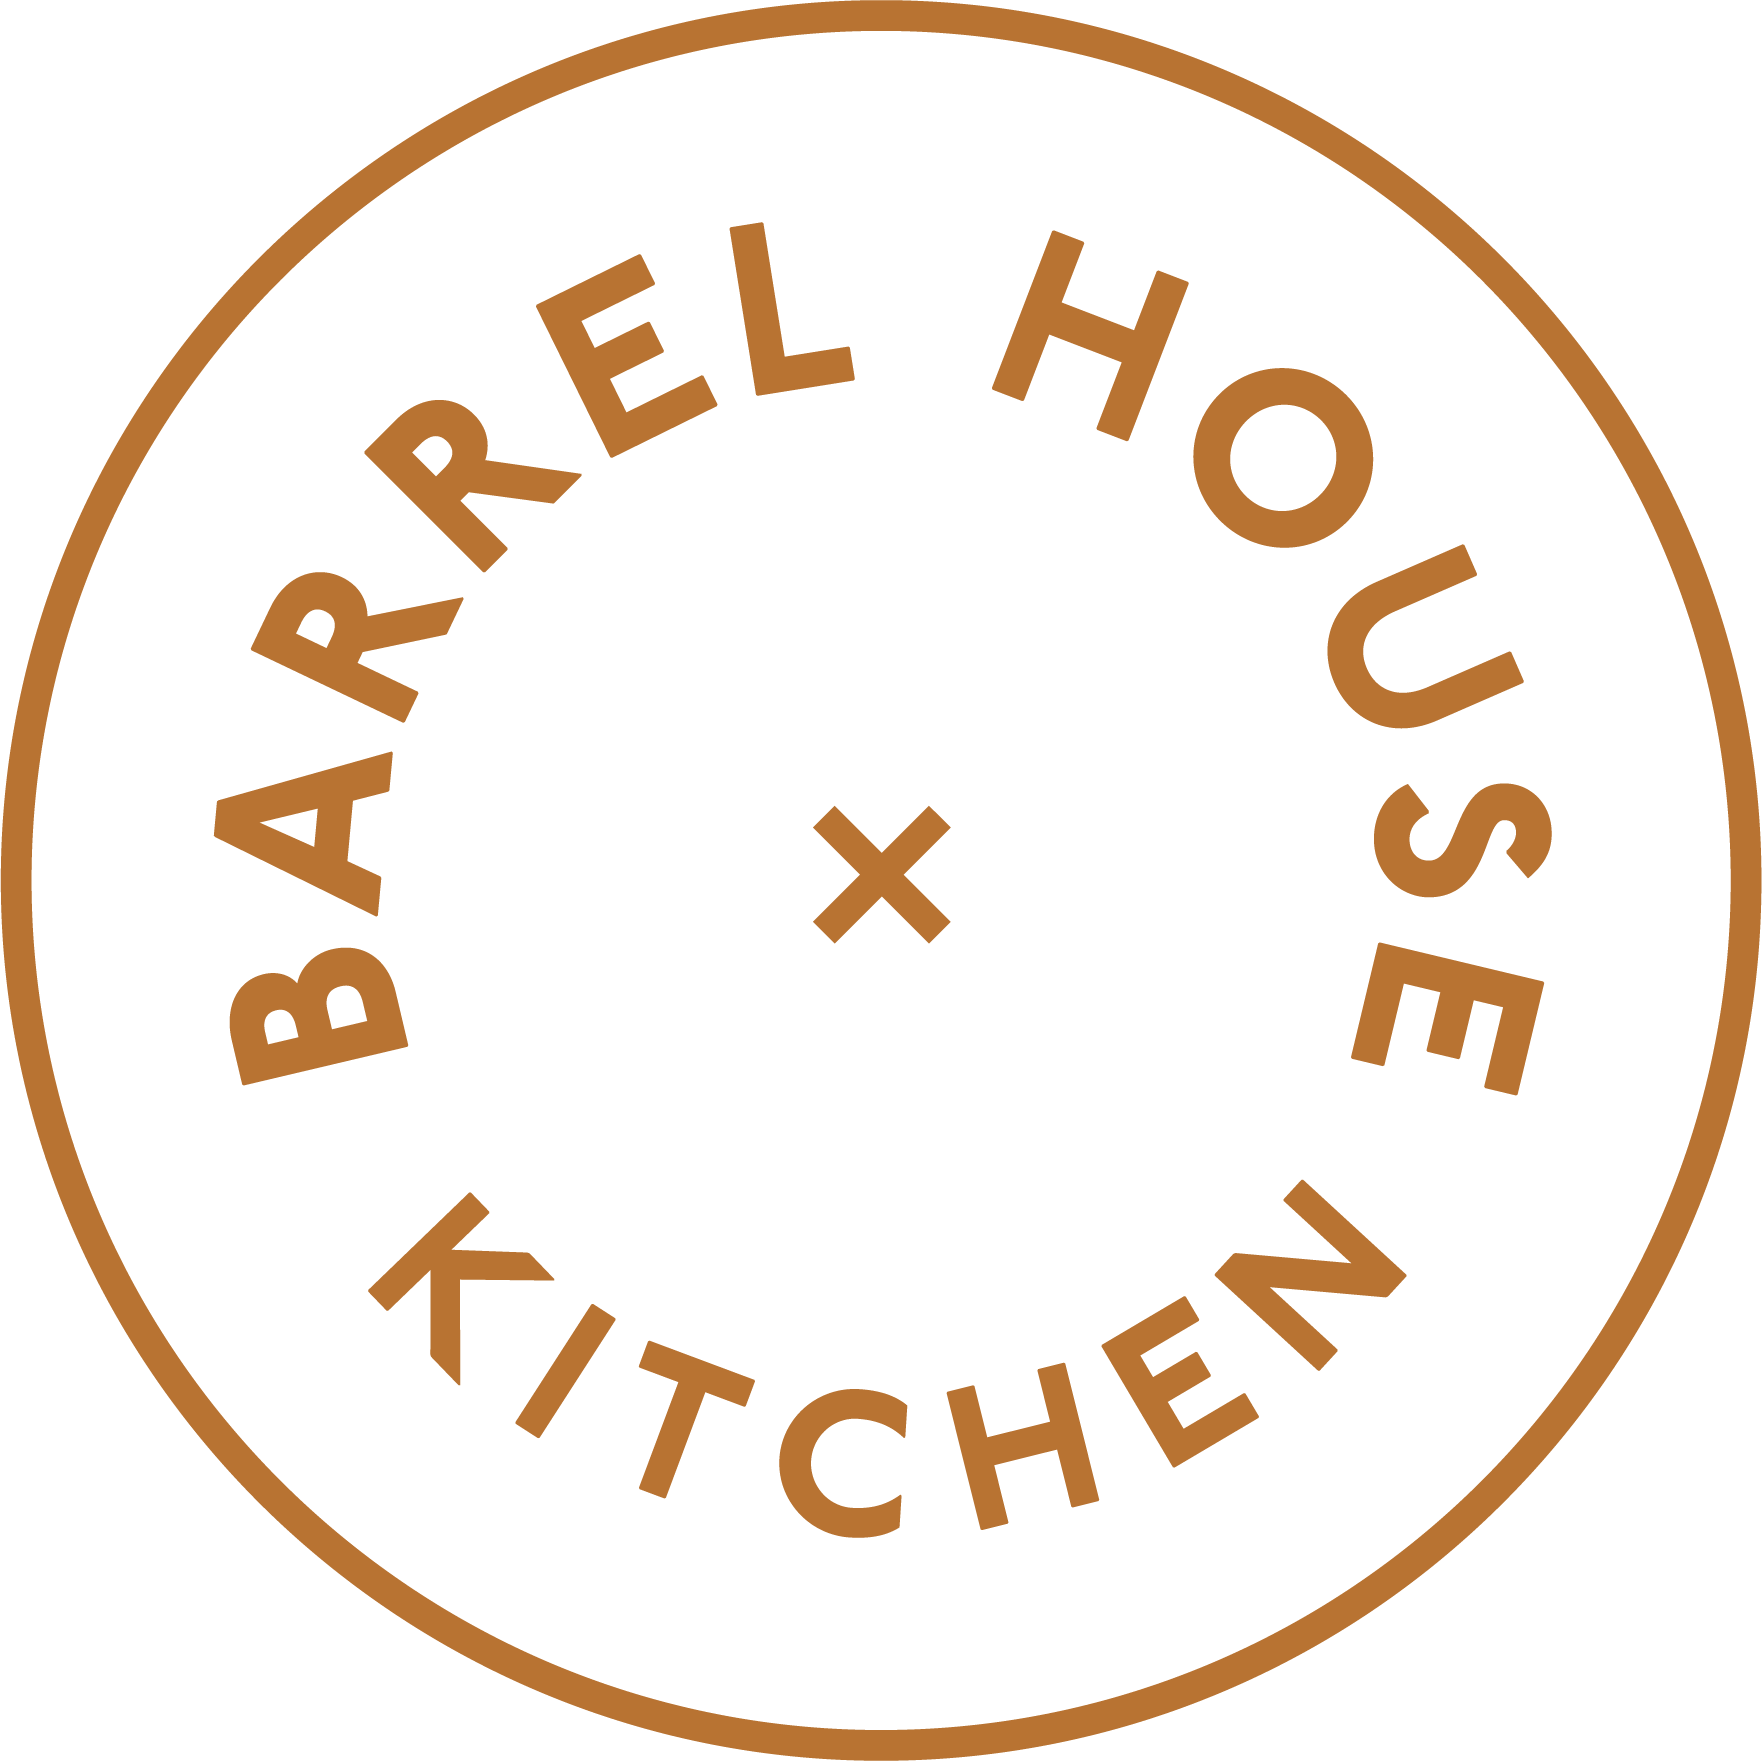 Barrel-House-x-Kitchen-copper